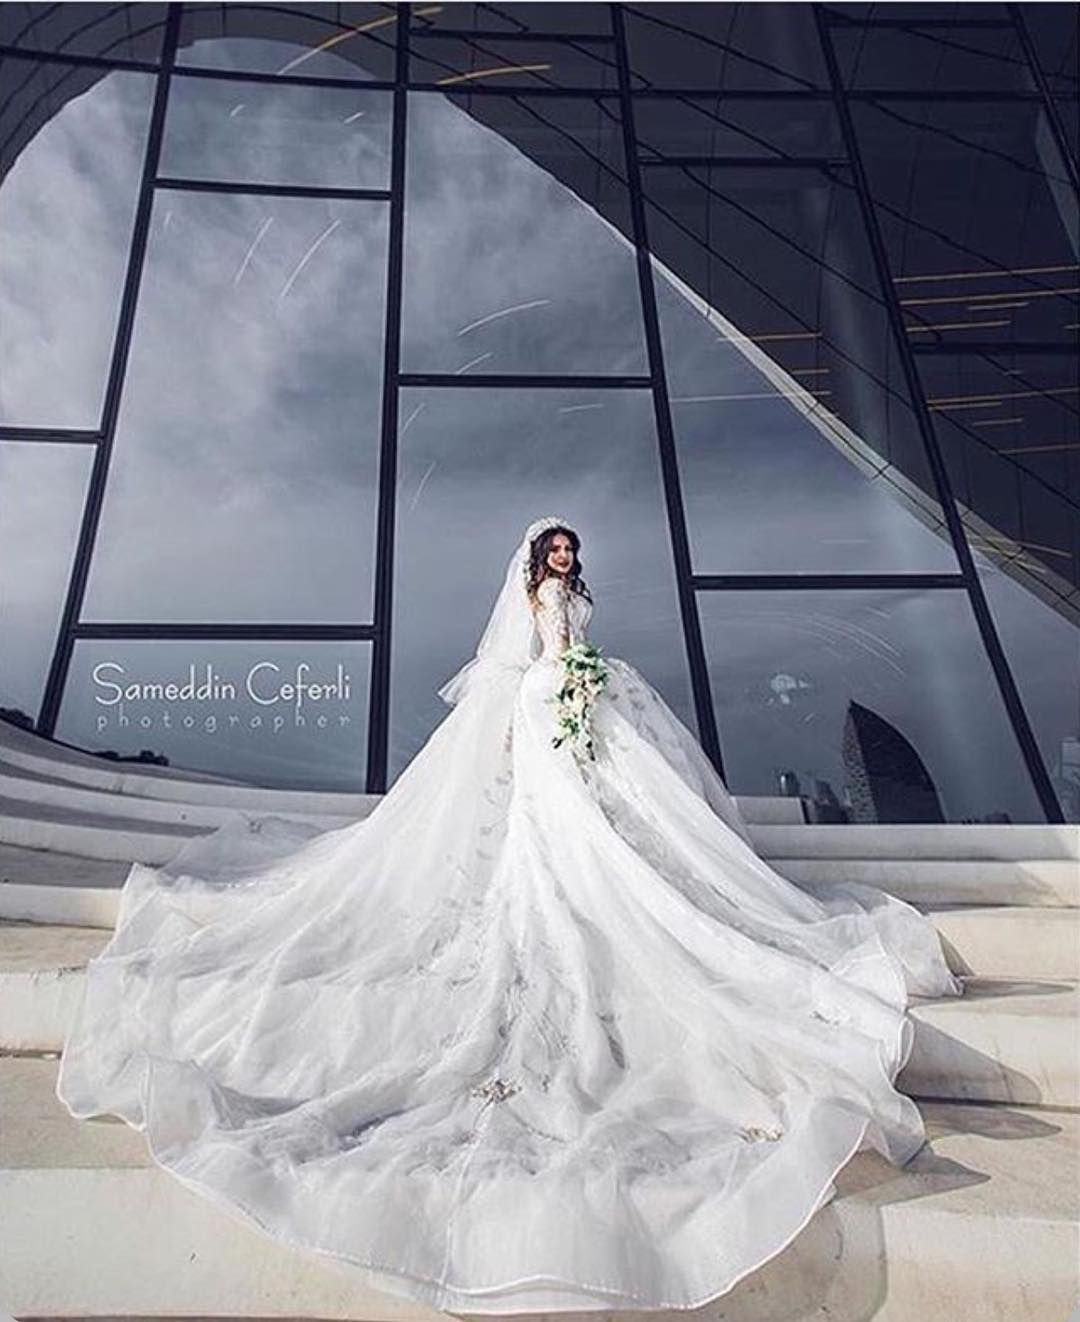 93 Begenme 2 Yorum Instagram 39 Da Estellita Haute Couture Estellita Haute Couture Quot Gelinlik Estellita D Wedding Dresses Dresses Haute Couture